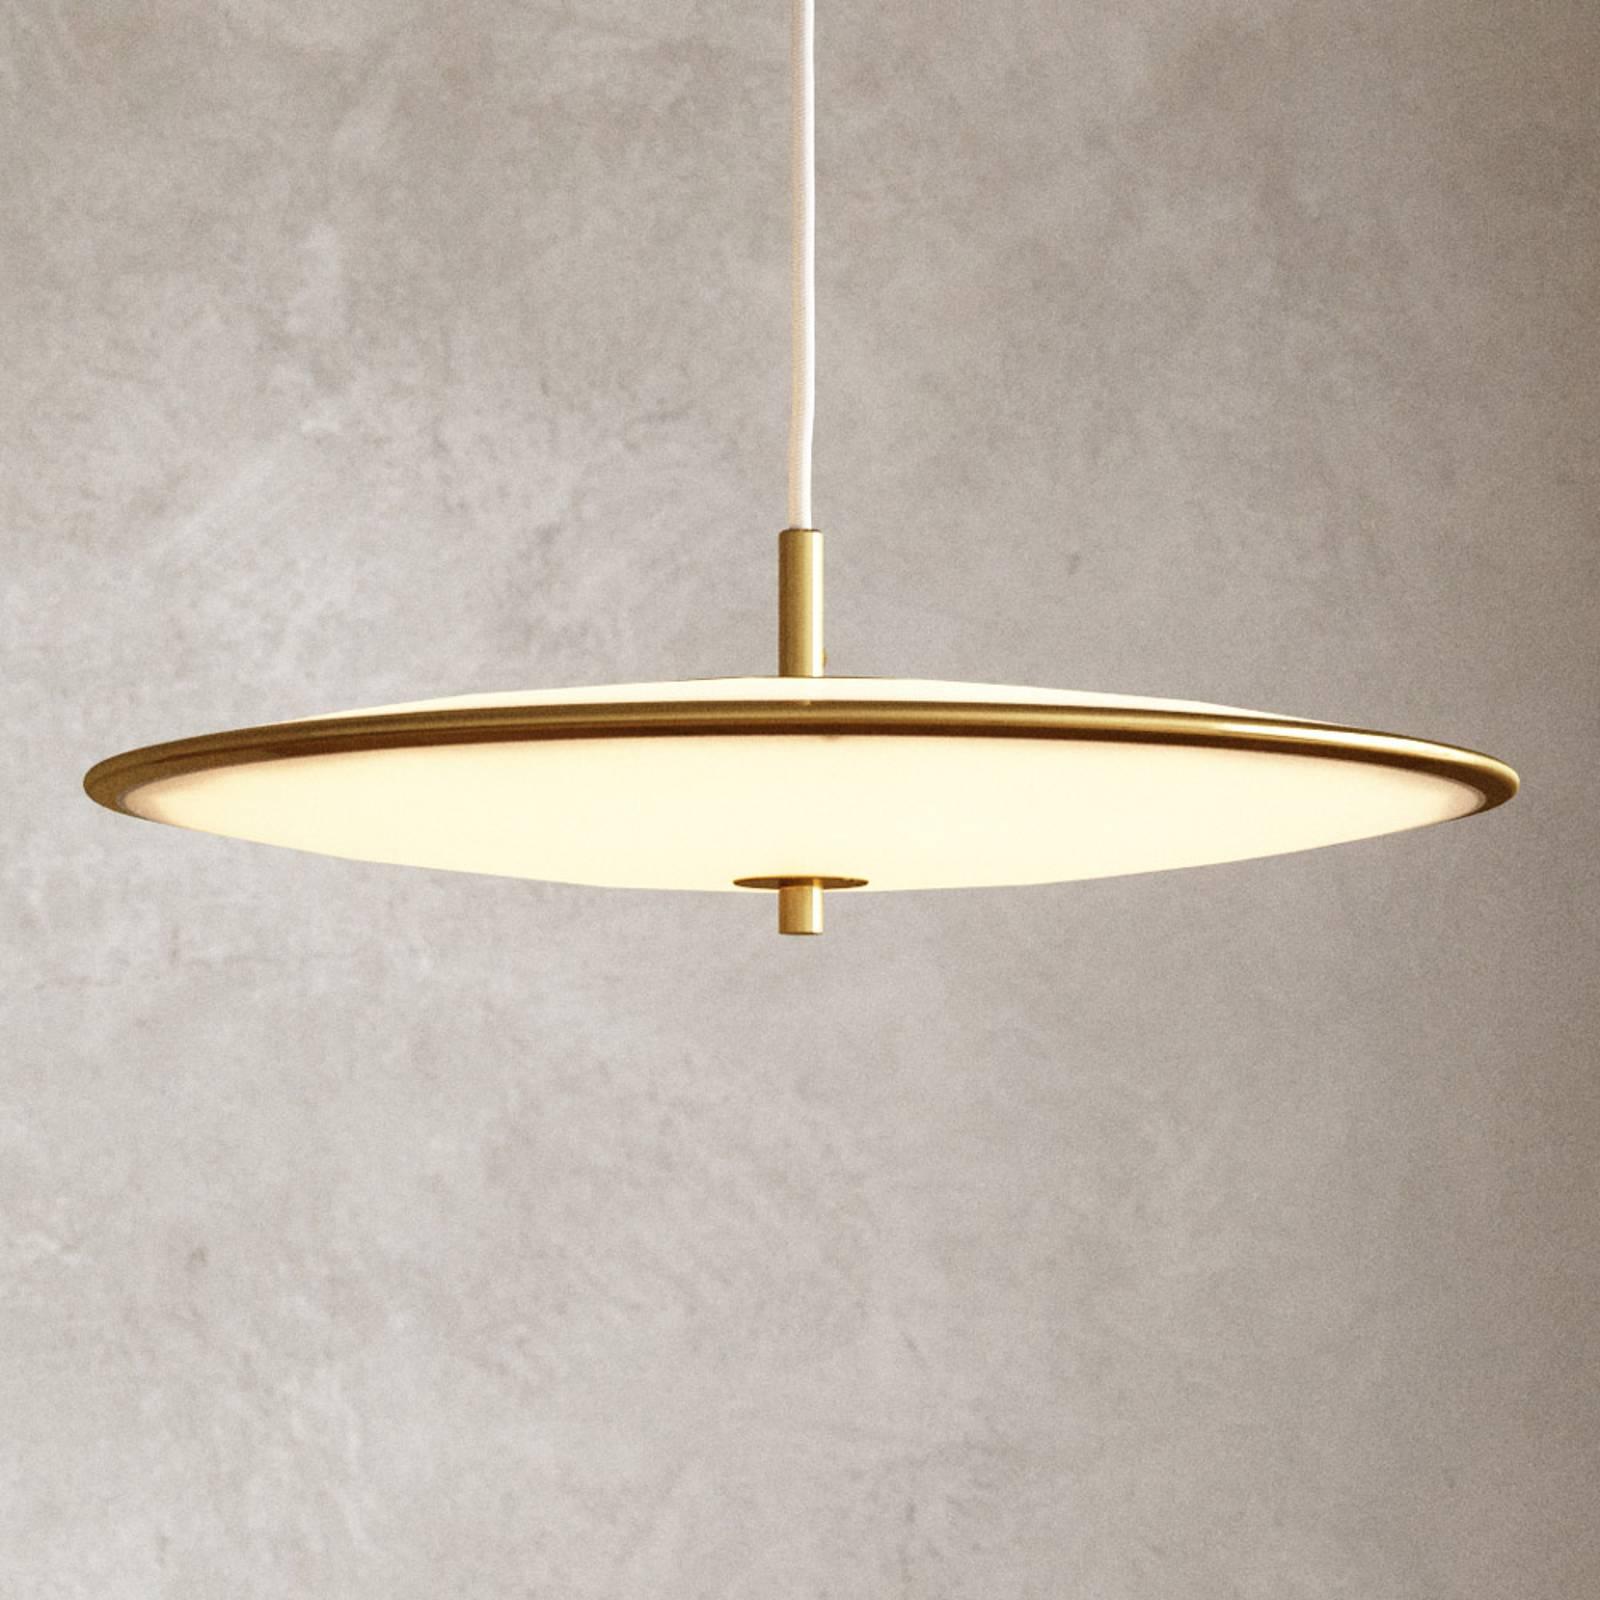 LED-Hängeleuchte Blanche, dimmbar, Ø 42 cm